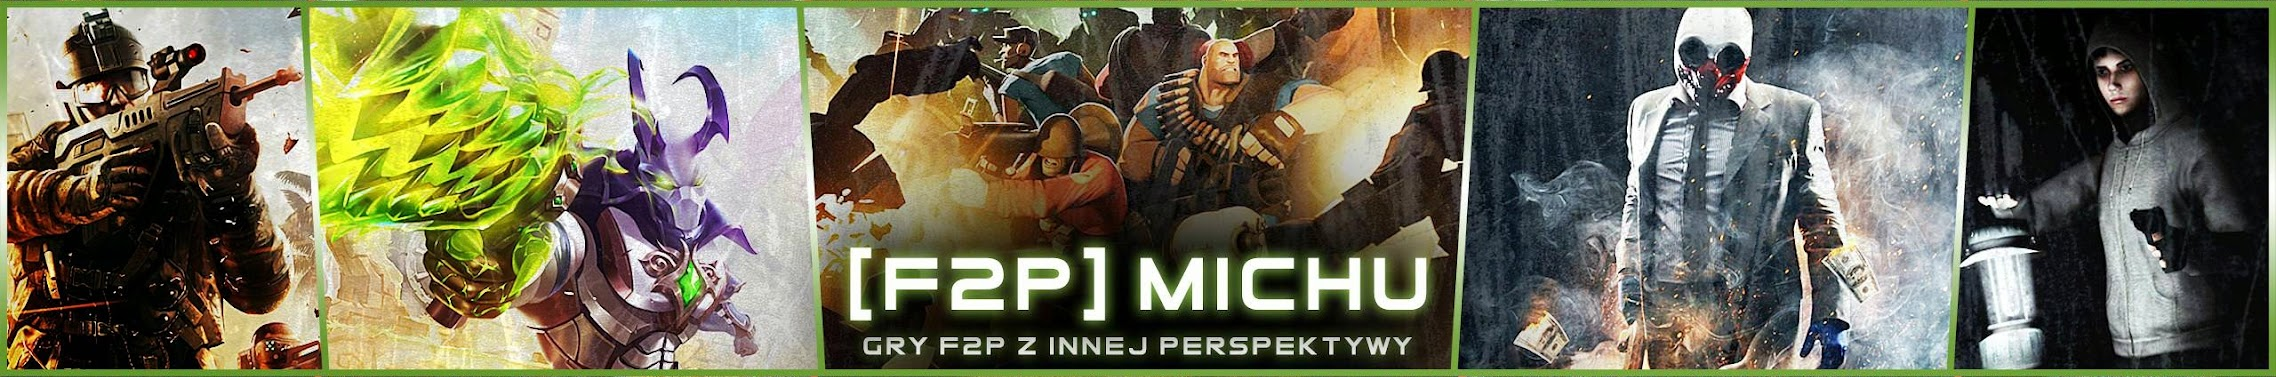 [F2P] Michu